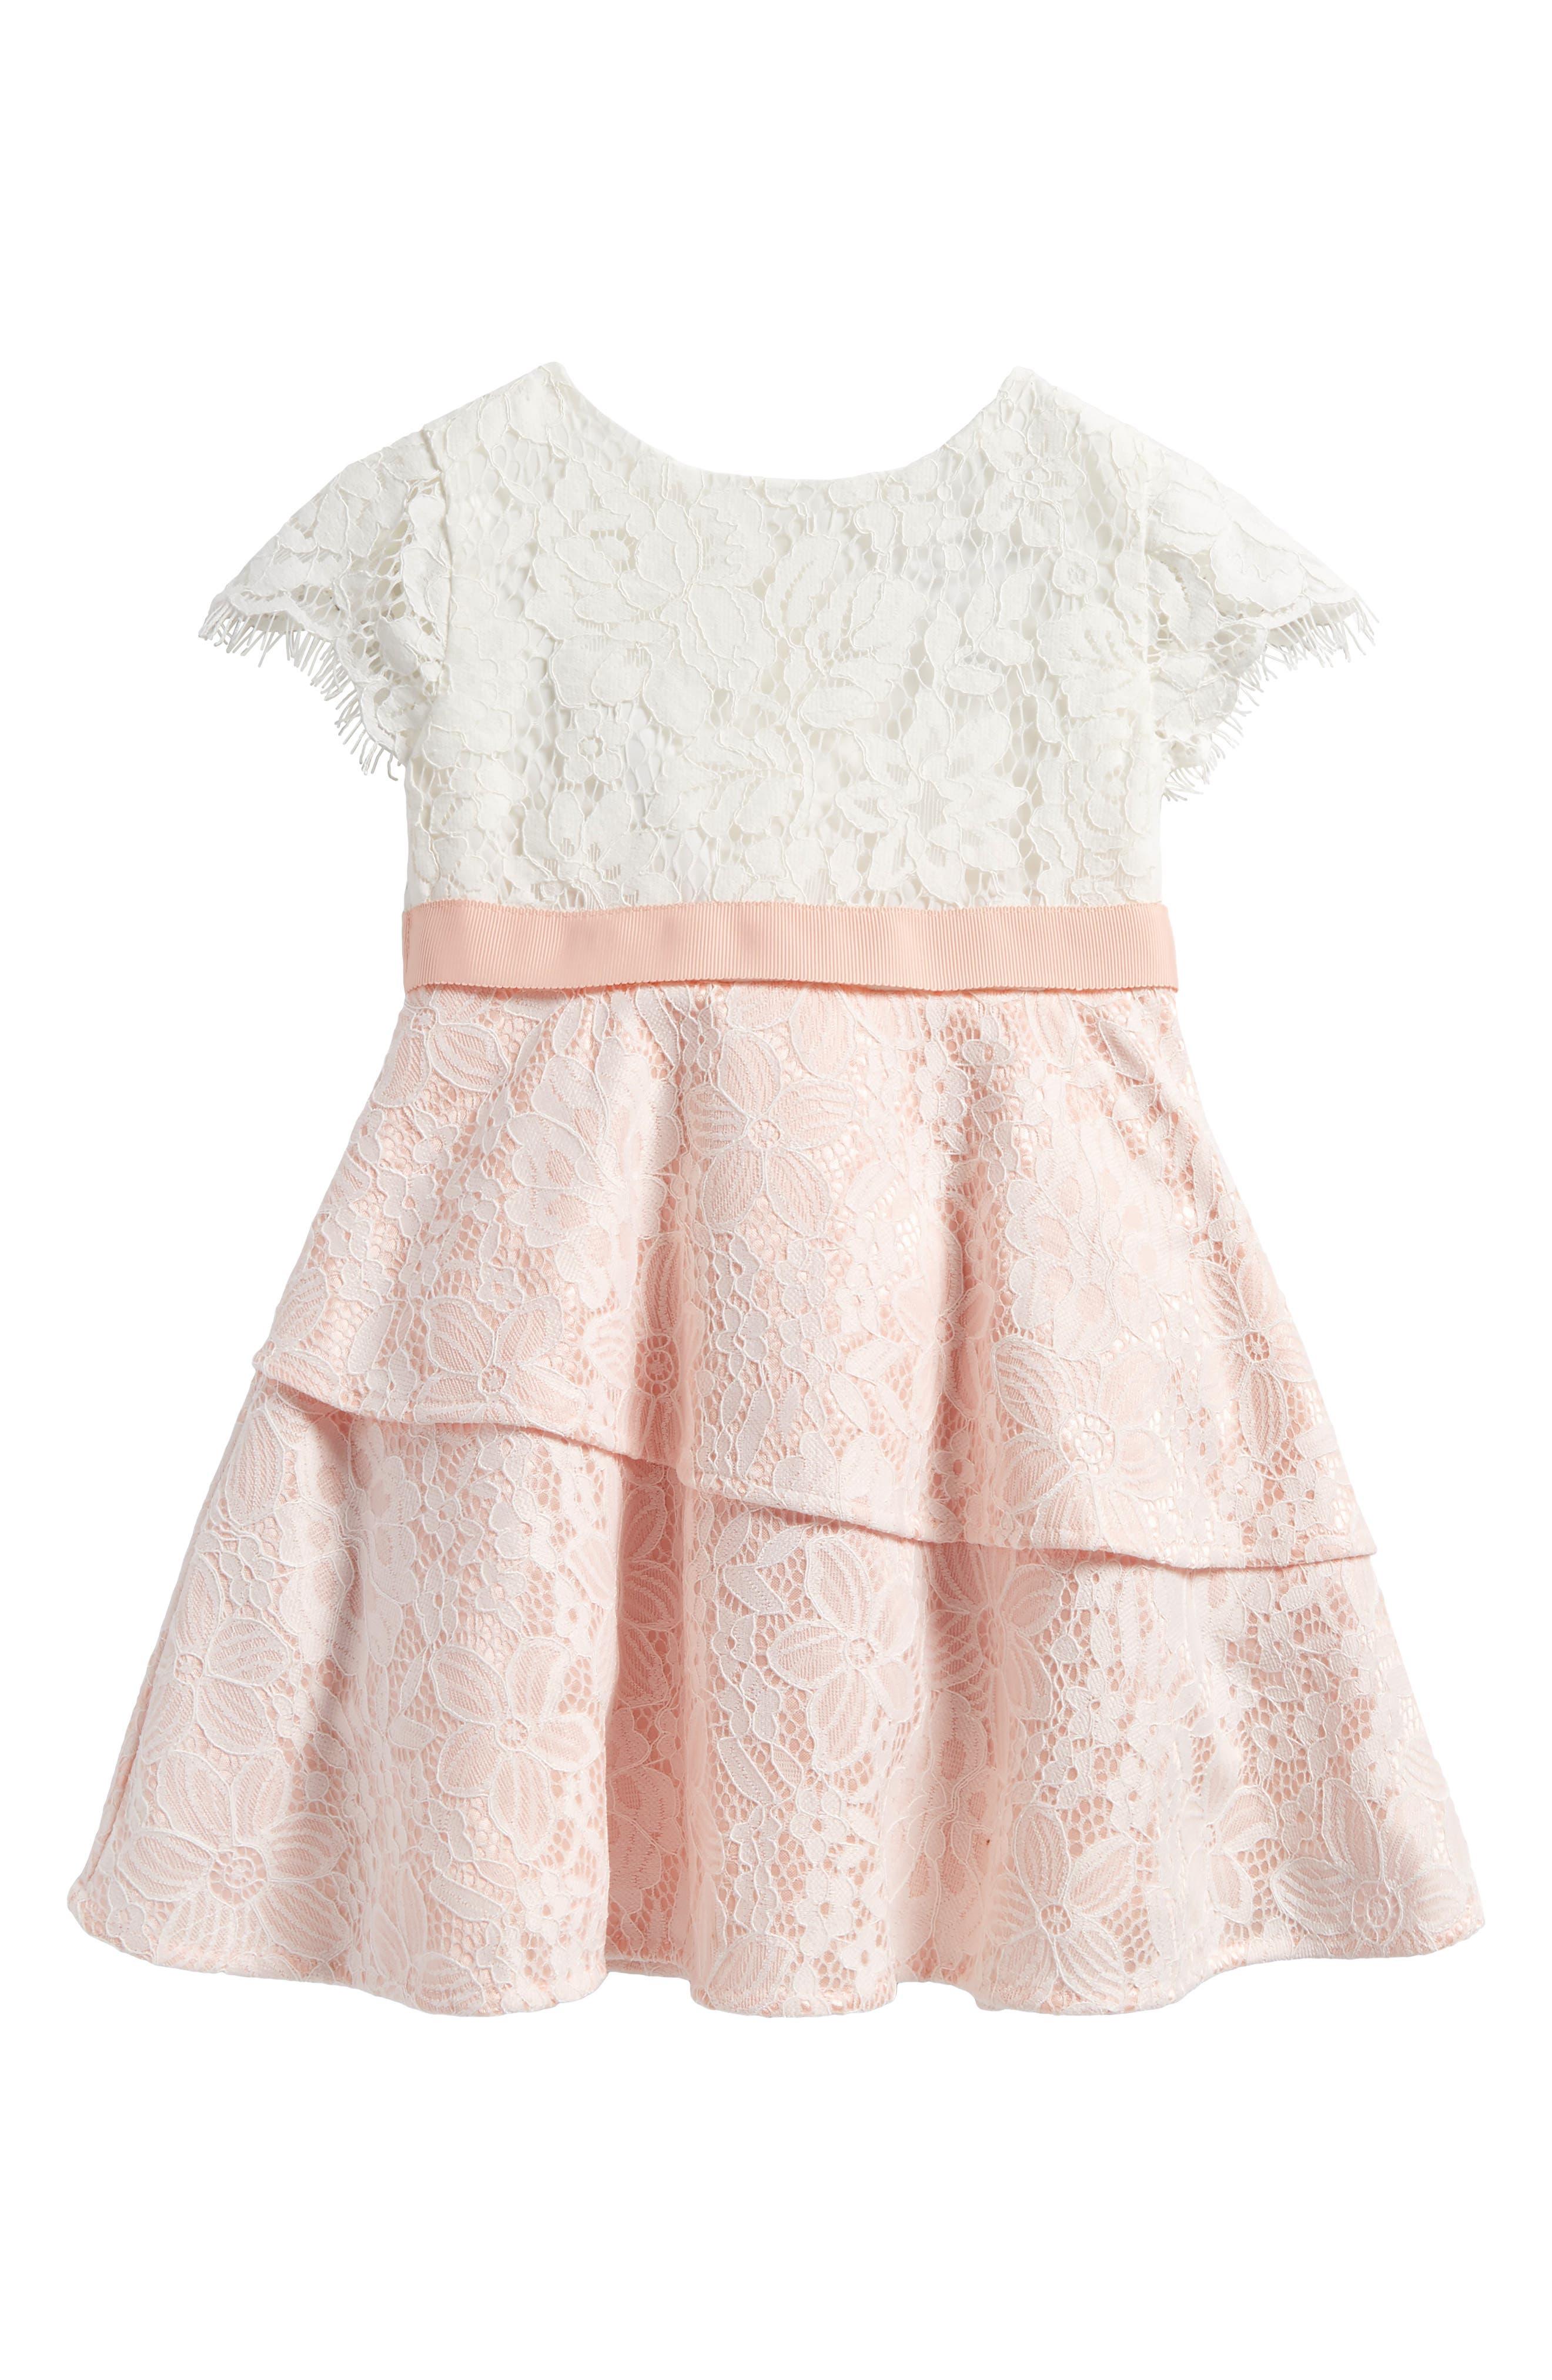 Main Image - Little Angels Cap Sleeve Lace Dress (Toddler Girls & Little Girls)